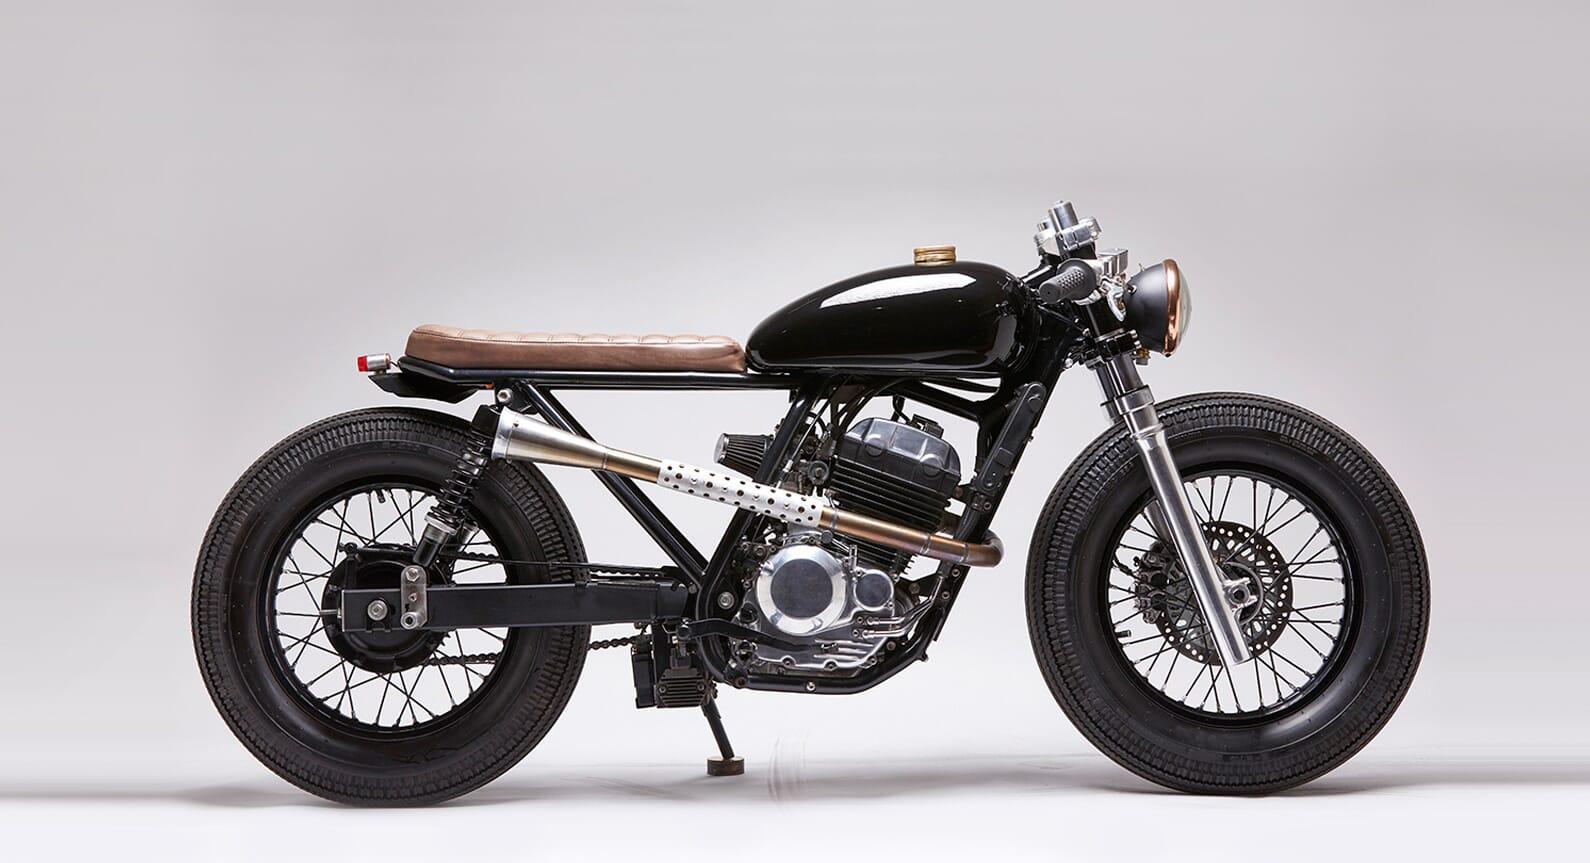 The Honda Tornado Café Racer By Vida Bandida Motorcycles